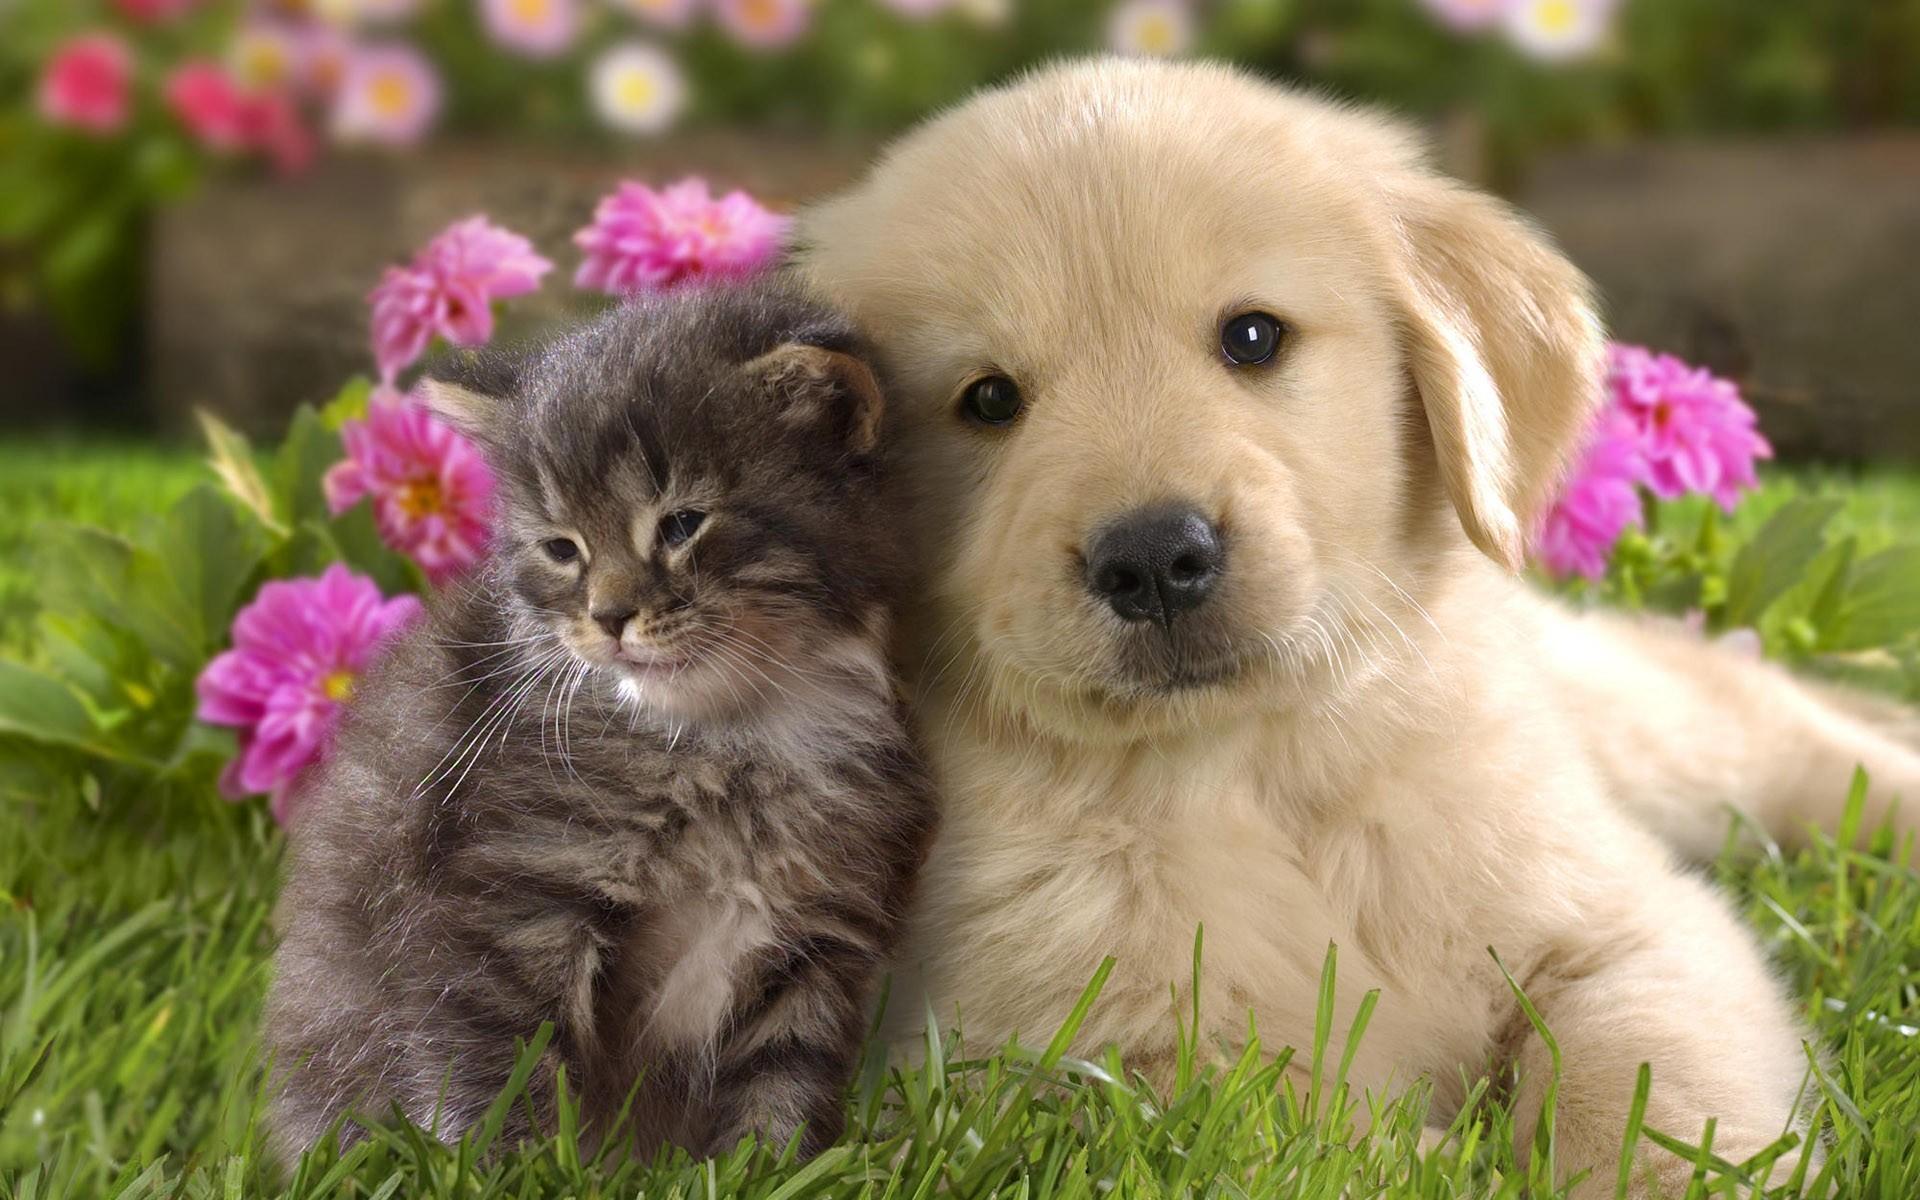 wdognet is your best friend in HD wallpapers searching